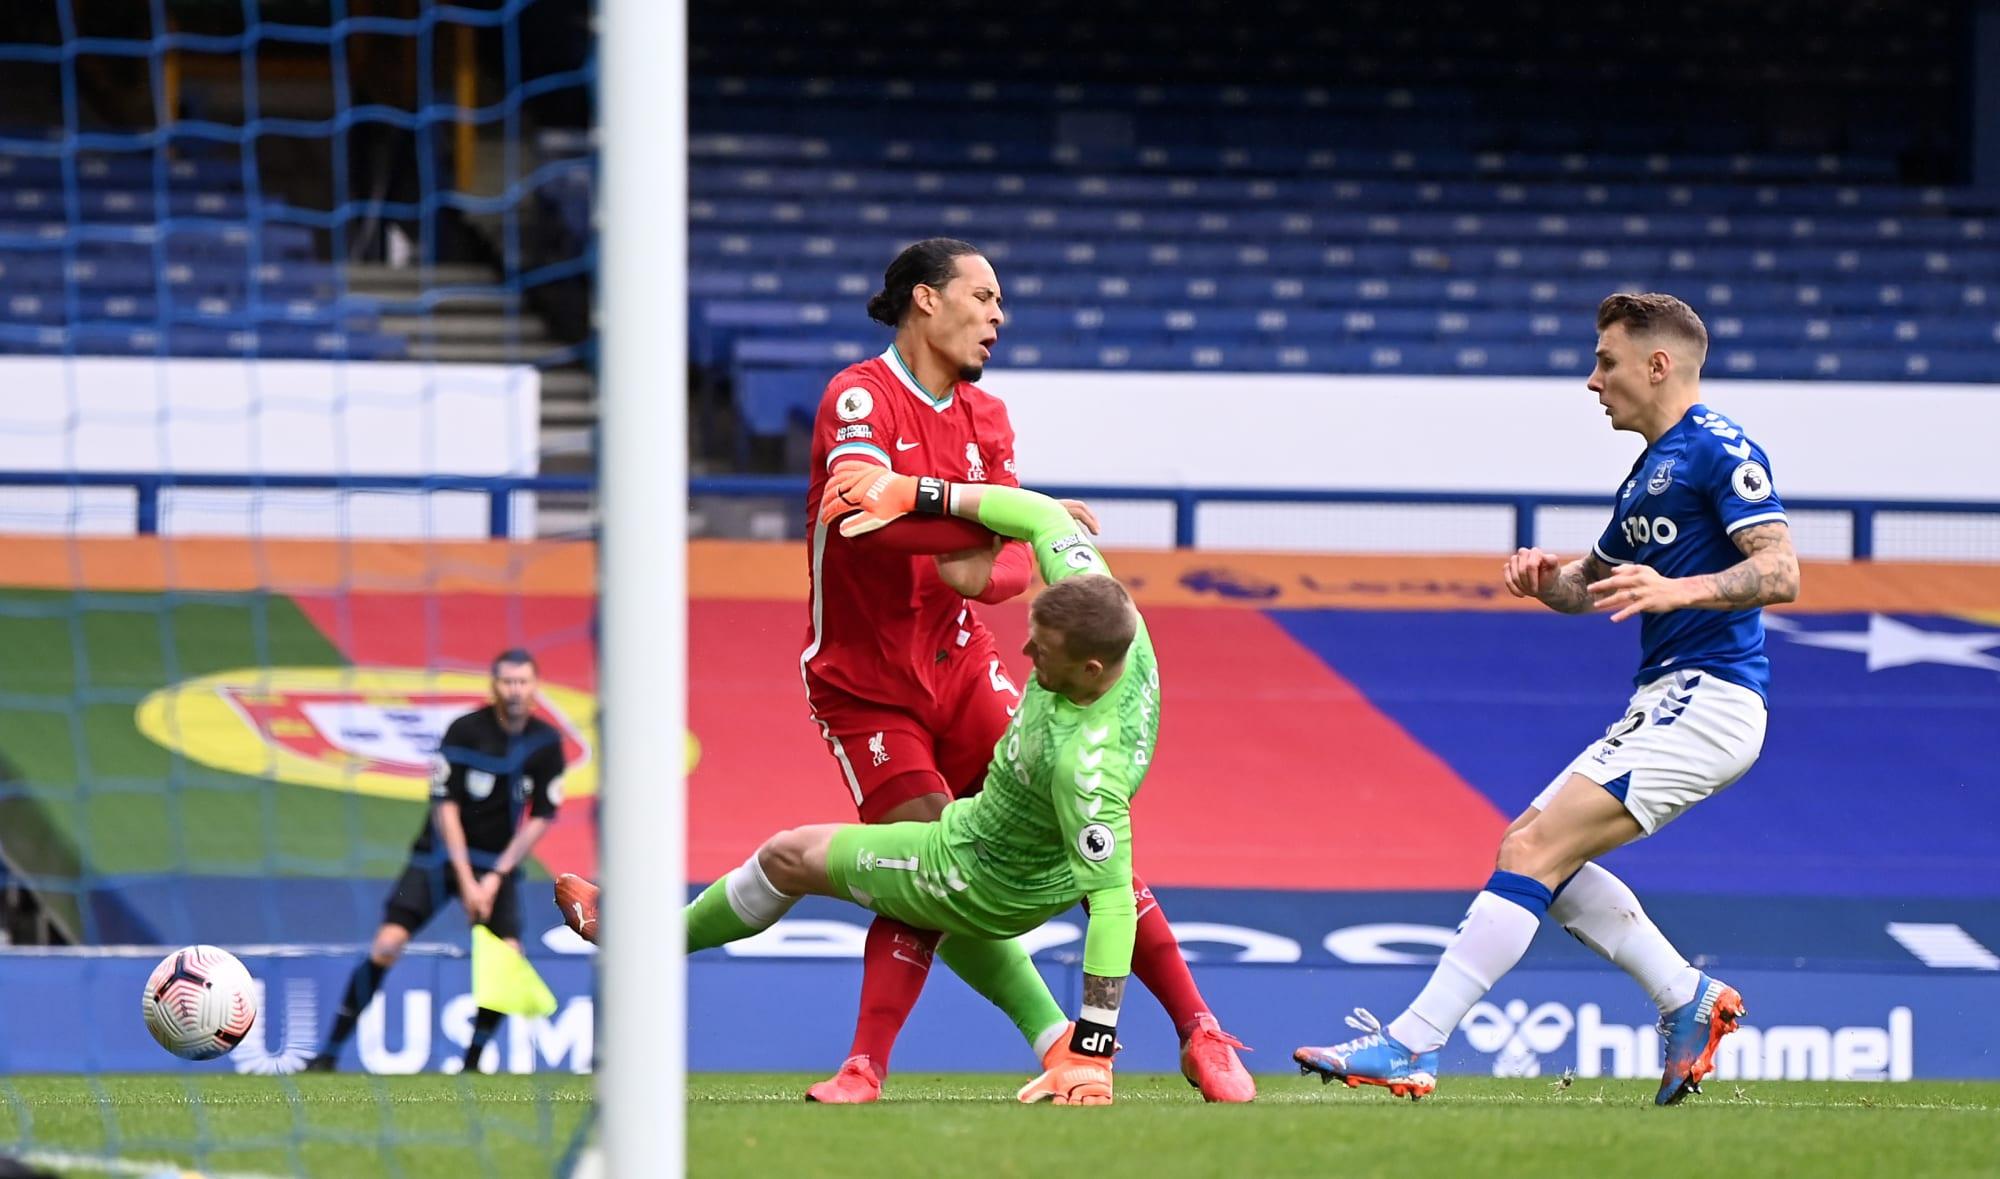 Media's reaction indicates anti-Everton bias